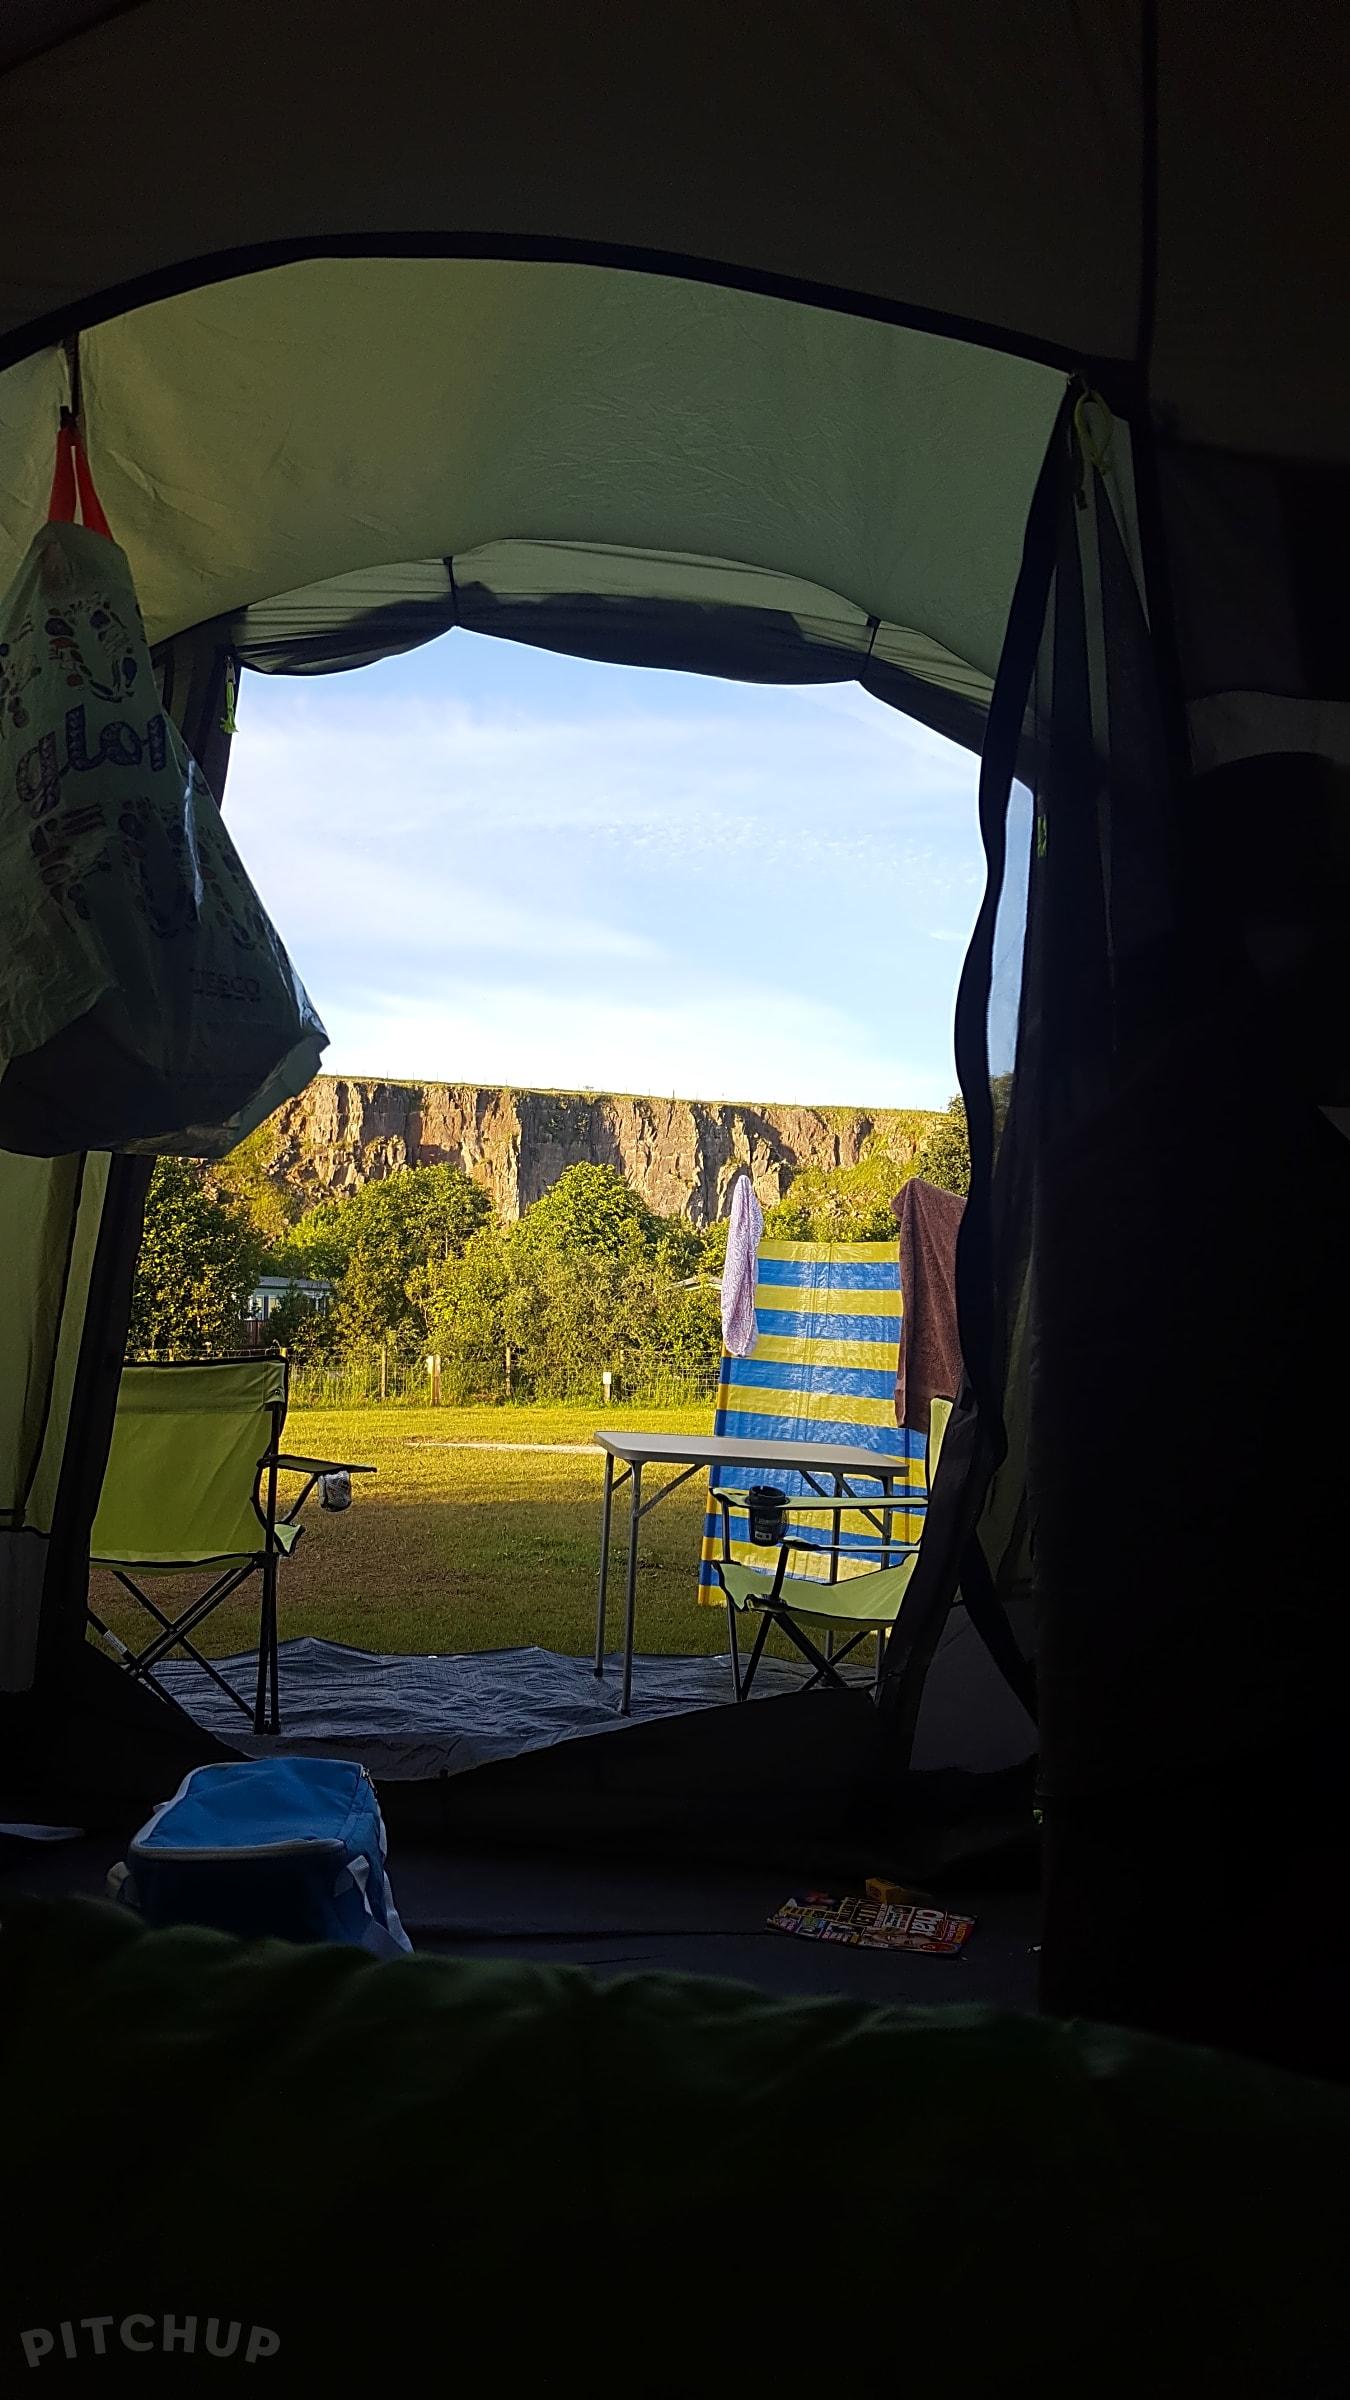 Rivendale Caravan and Leisure Park, Ashbourne - Pitchup®